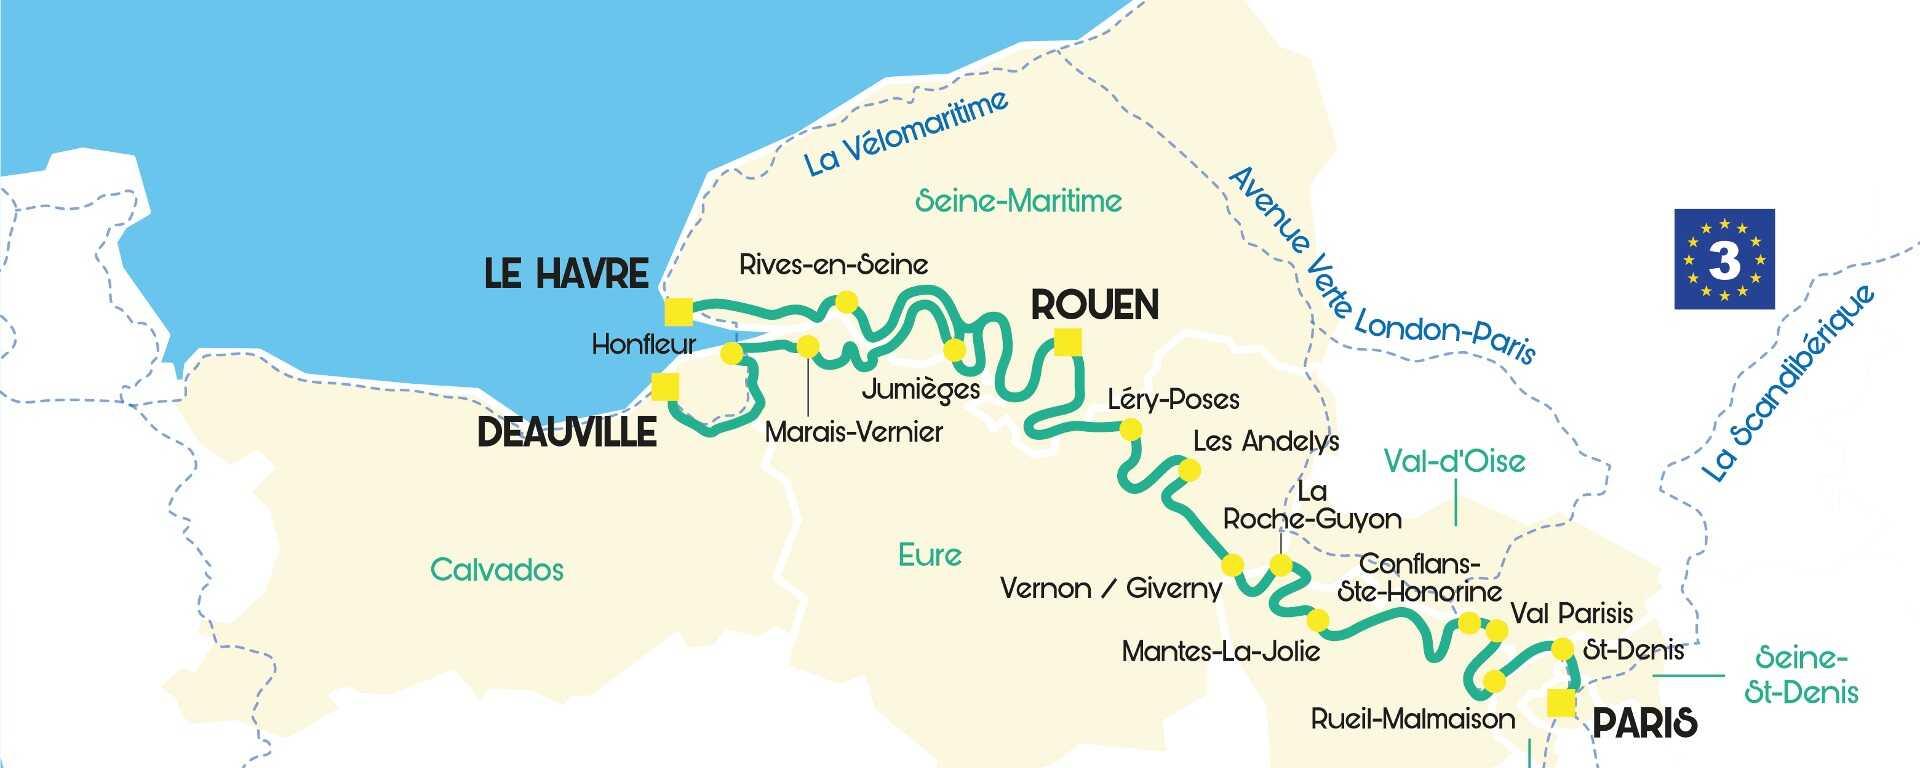 La Seine A Velo Un Nouvel Itineraire